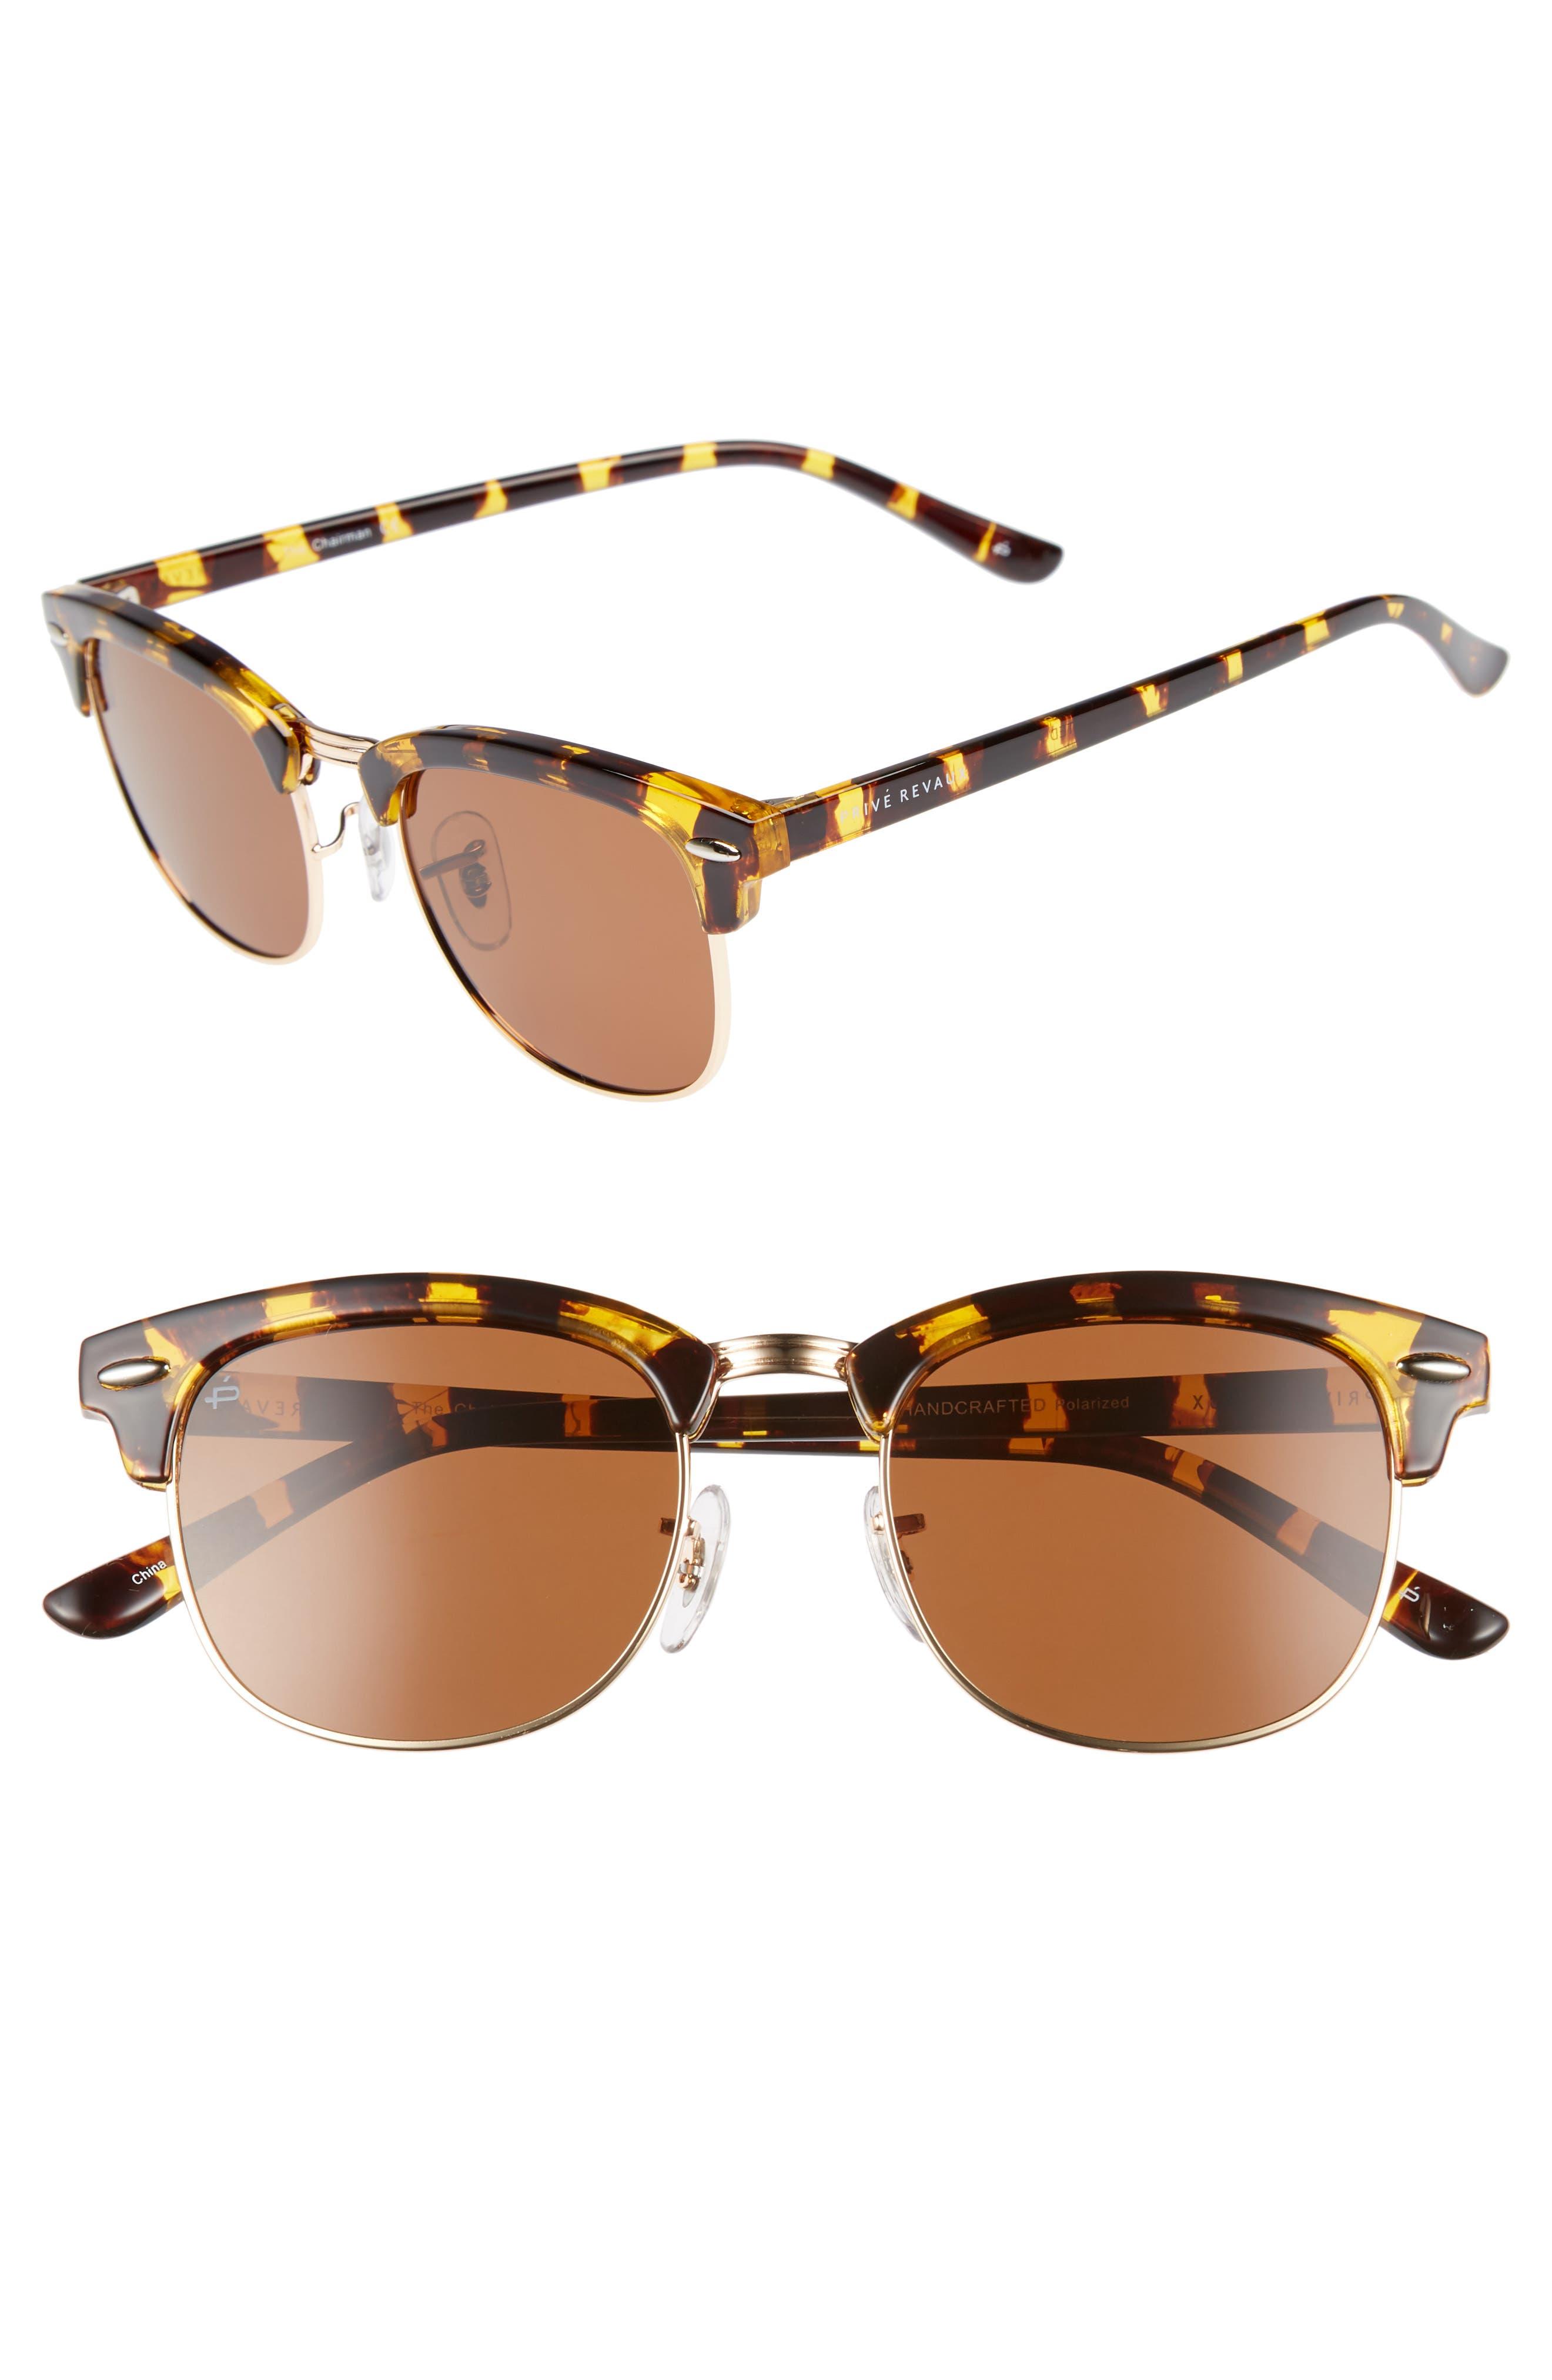 Privé Revaux The Chairman 52mm Polarized Browline Sunglasses,                             Main thumbnail 2, color,